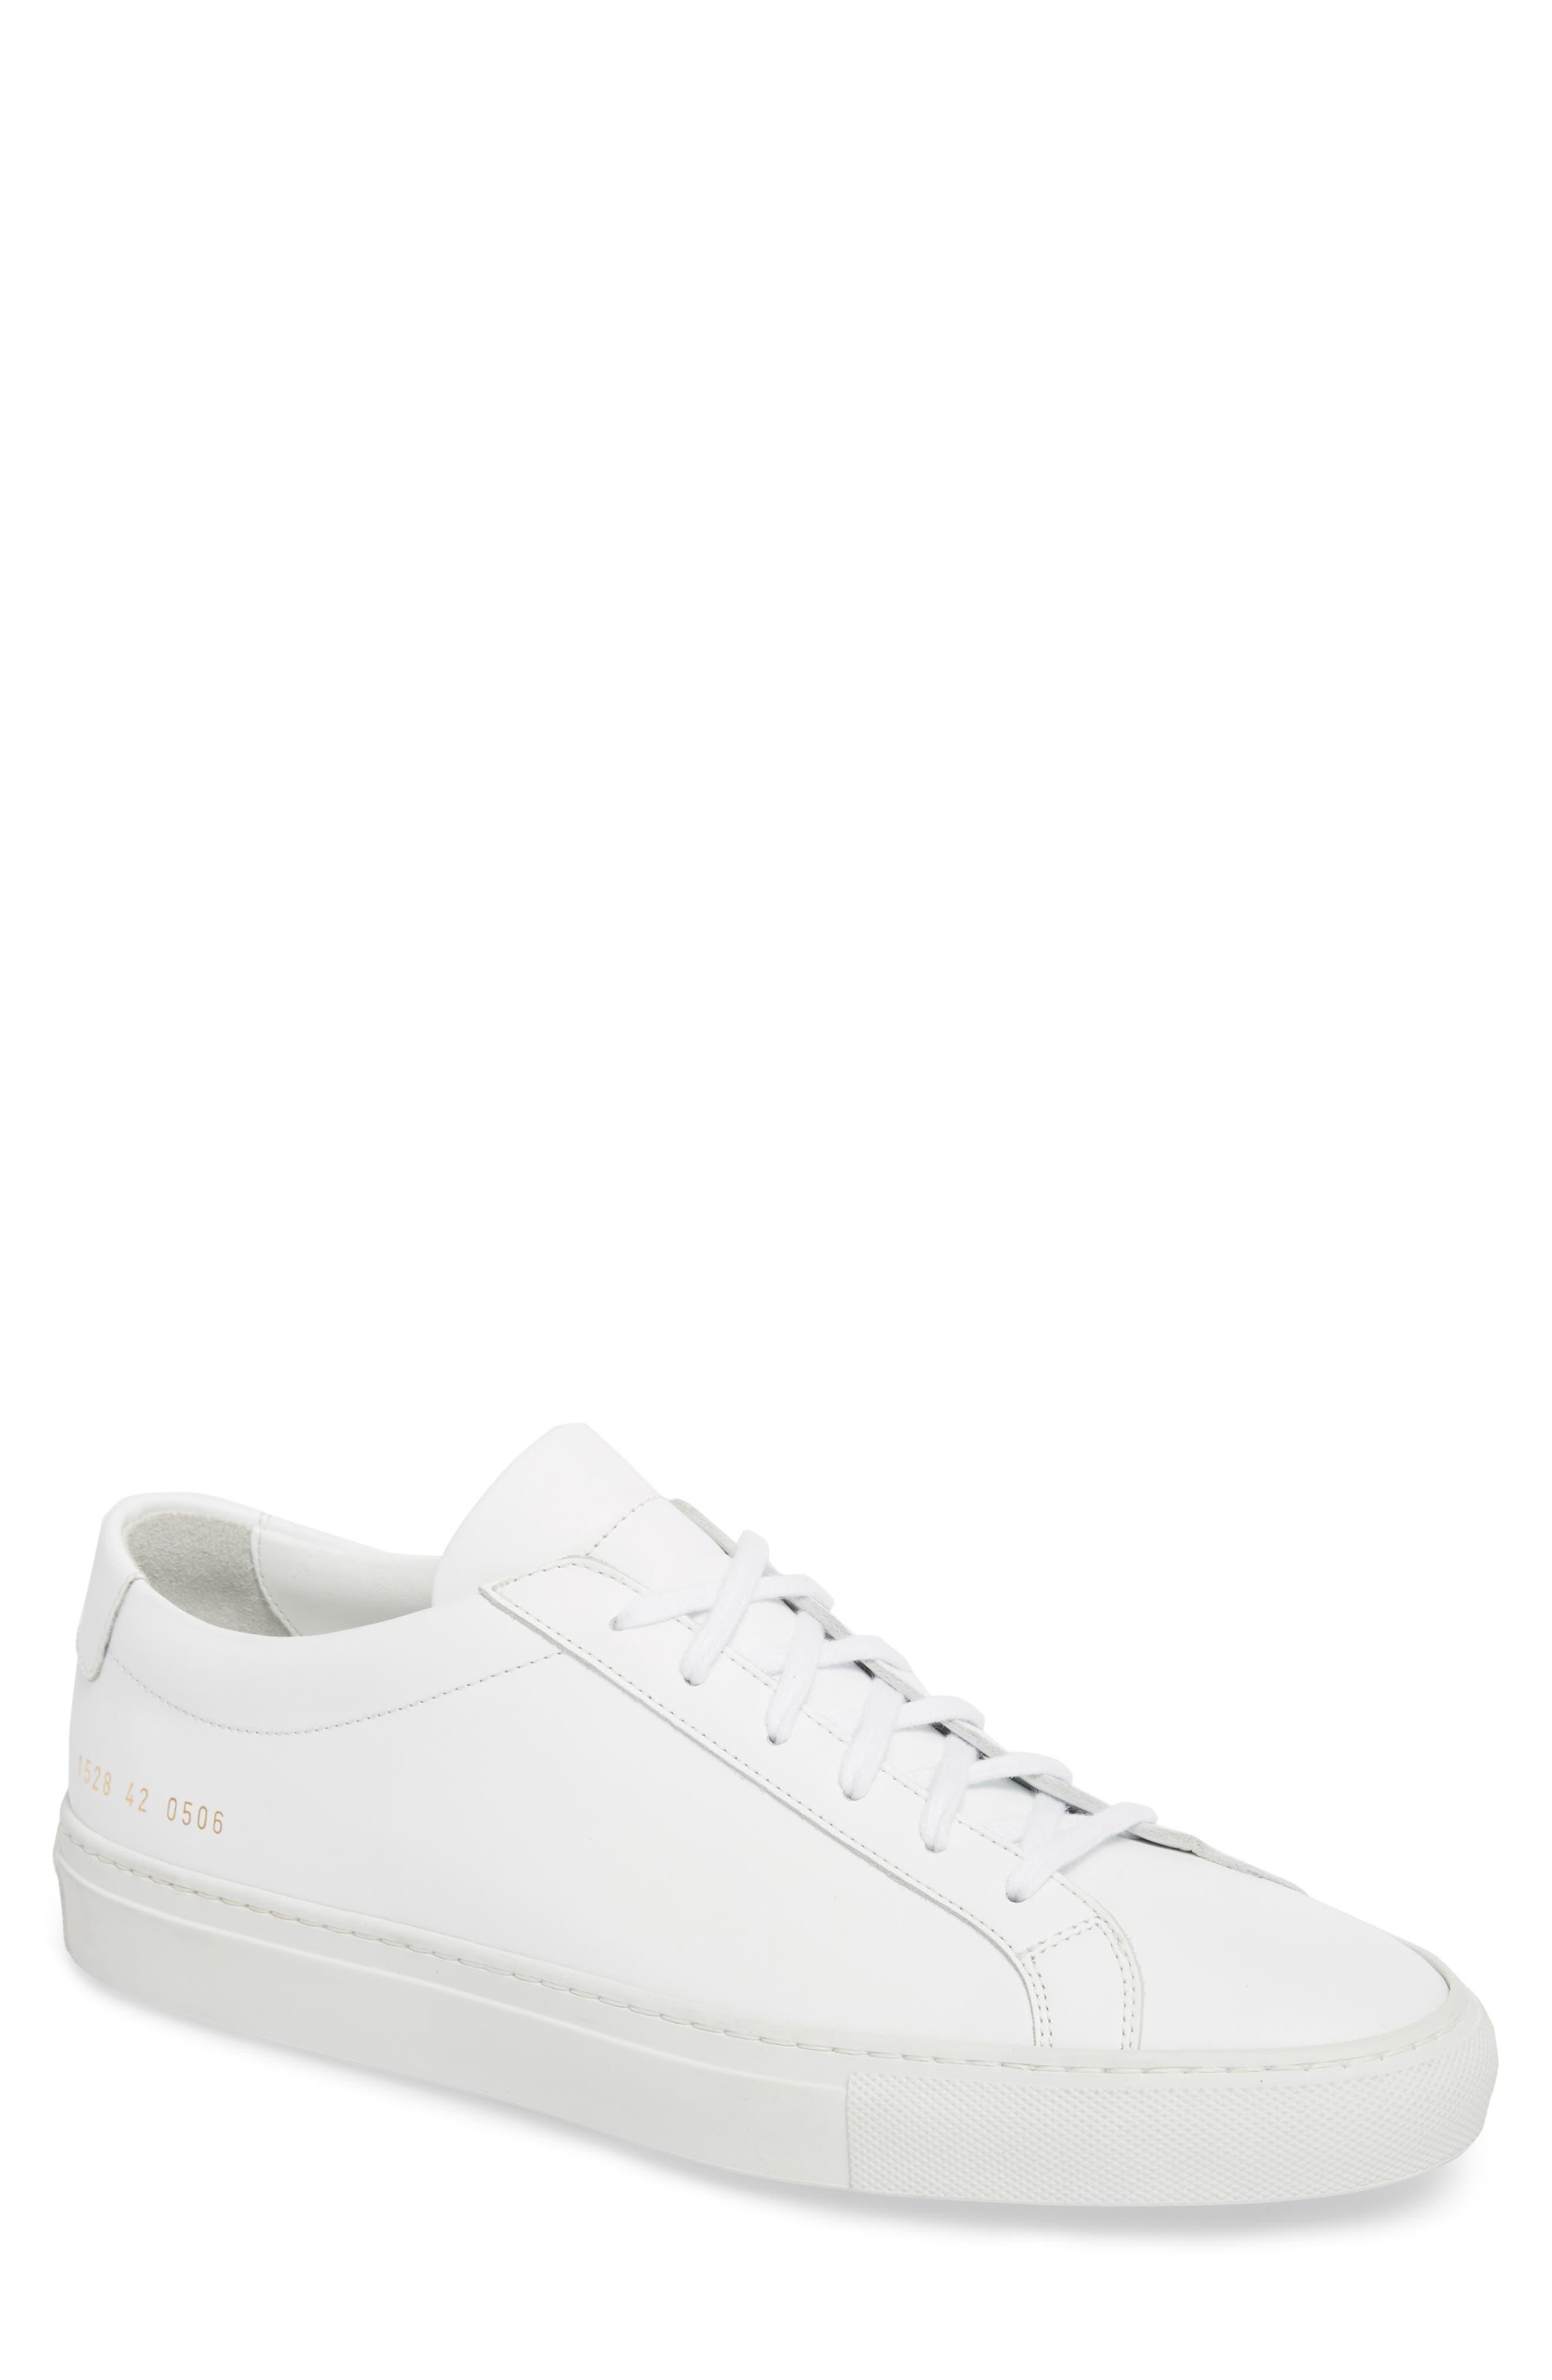 COMMON PROJECTS, Original Achilles Sneaker, Main thumbnail 1, color, WHITE